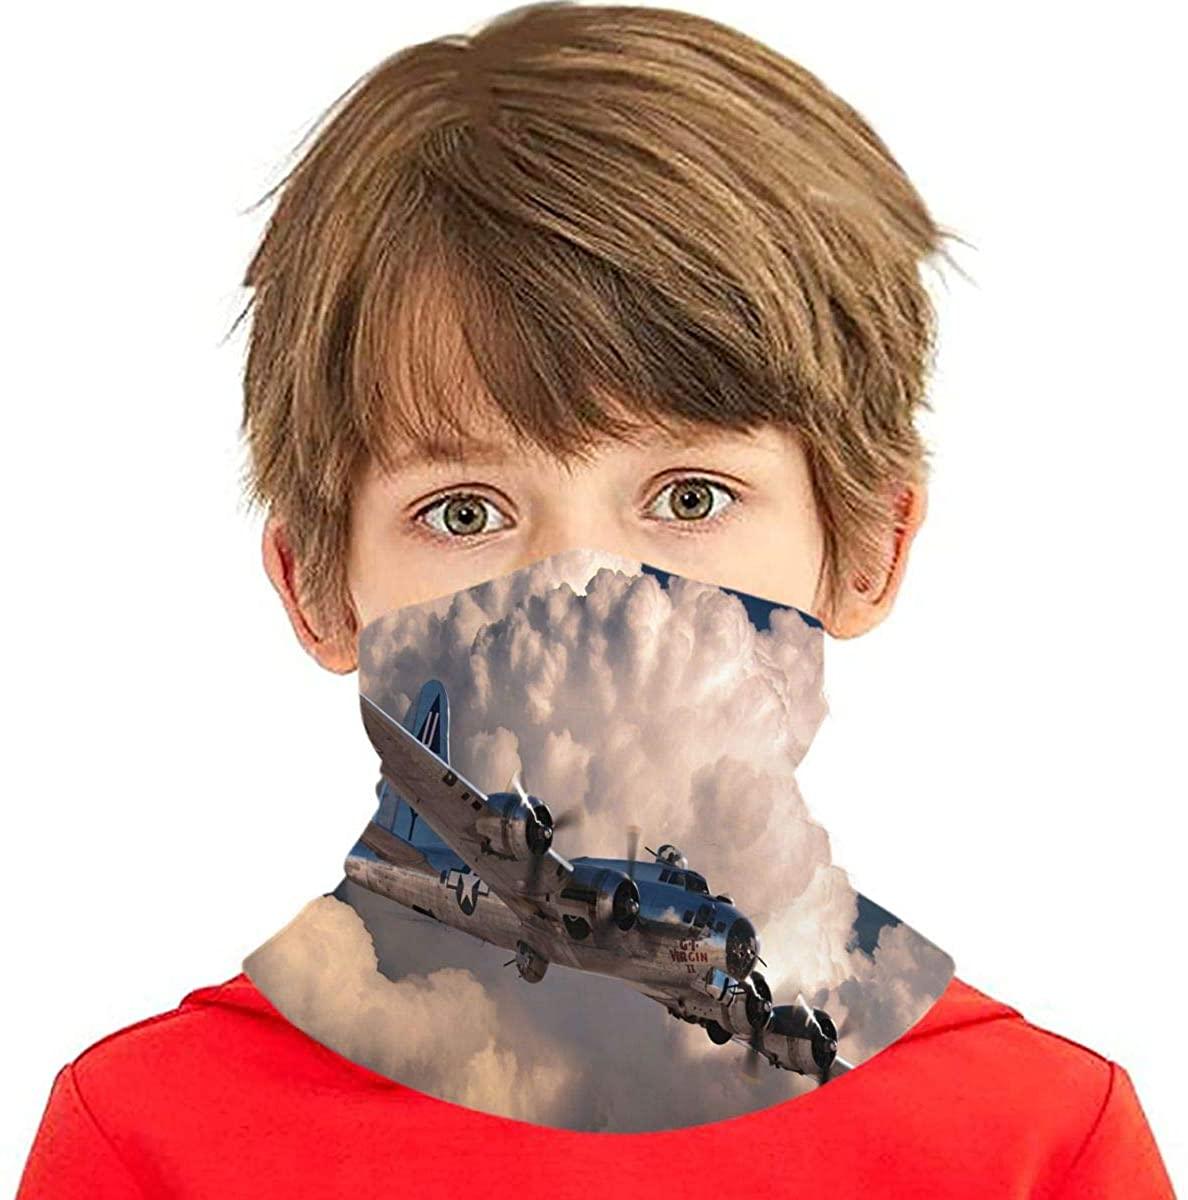 Art Aircraft Military Clouds Storm Lightning Children's Face Scarf Windproof Protection Balaclava, Multifunctional Headwear Neck Gaiter for Kids Teens, Dust Sun Uv Black